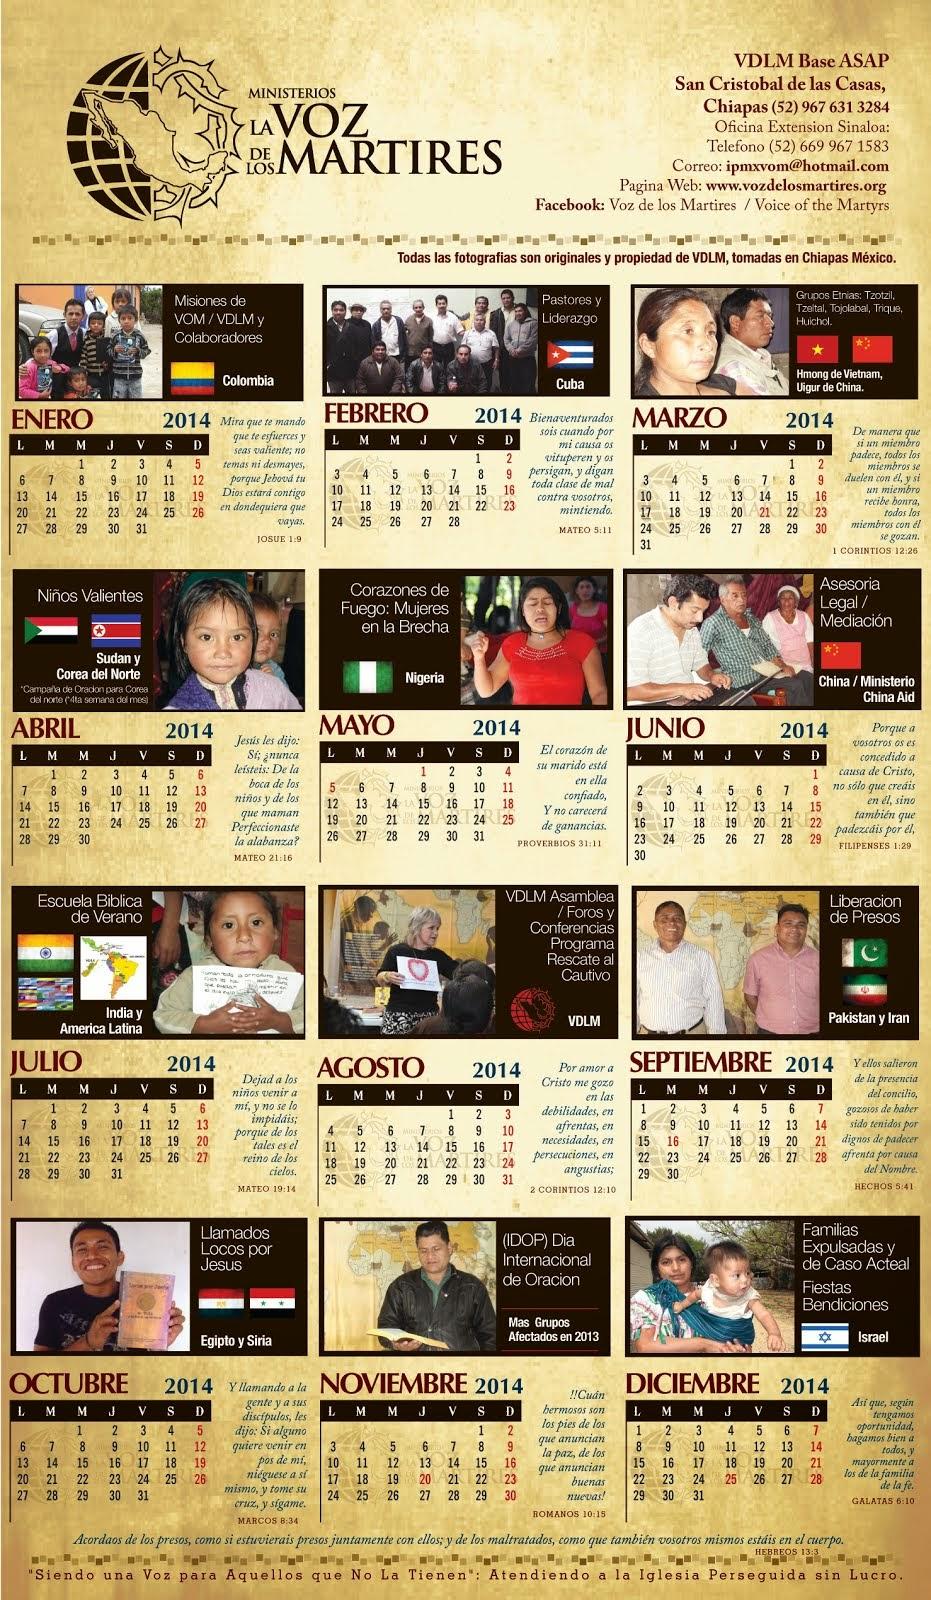 VDLM Calendar 2014